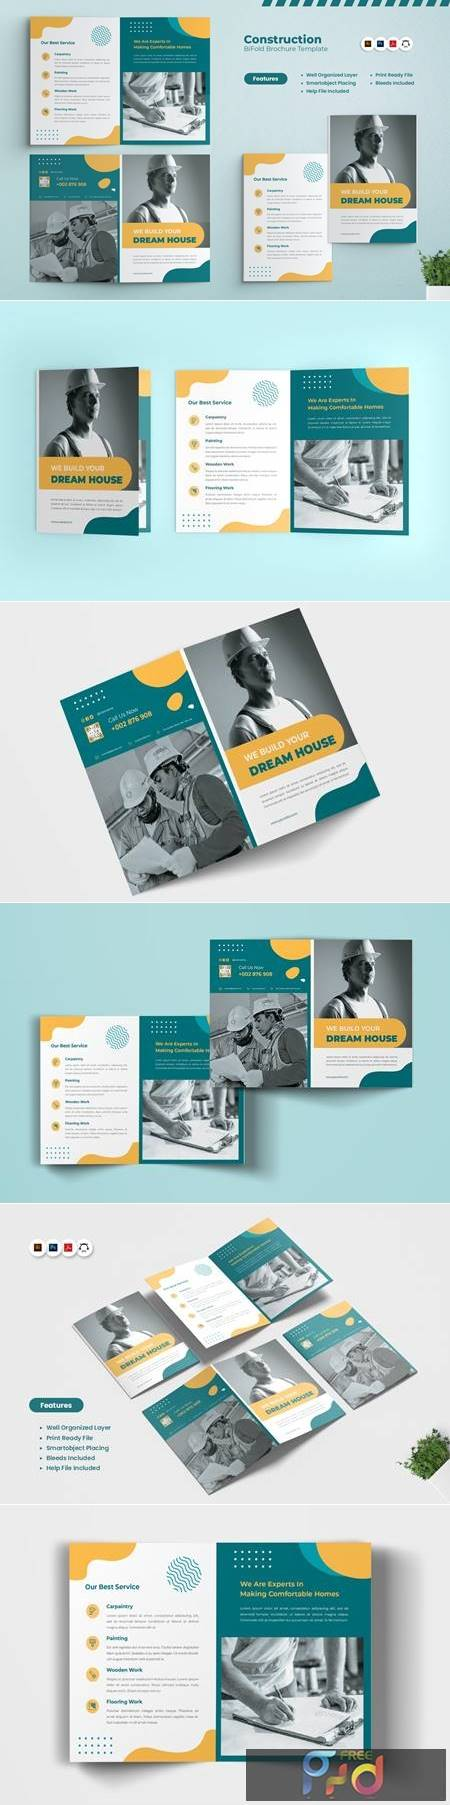 Construction Bi-Fold Brochure J7LSKBP 1